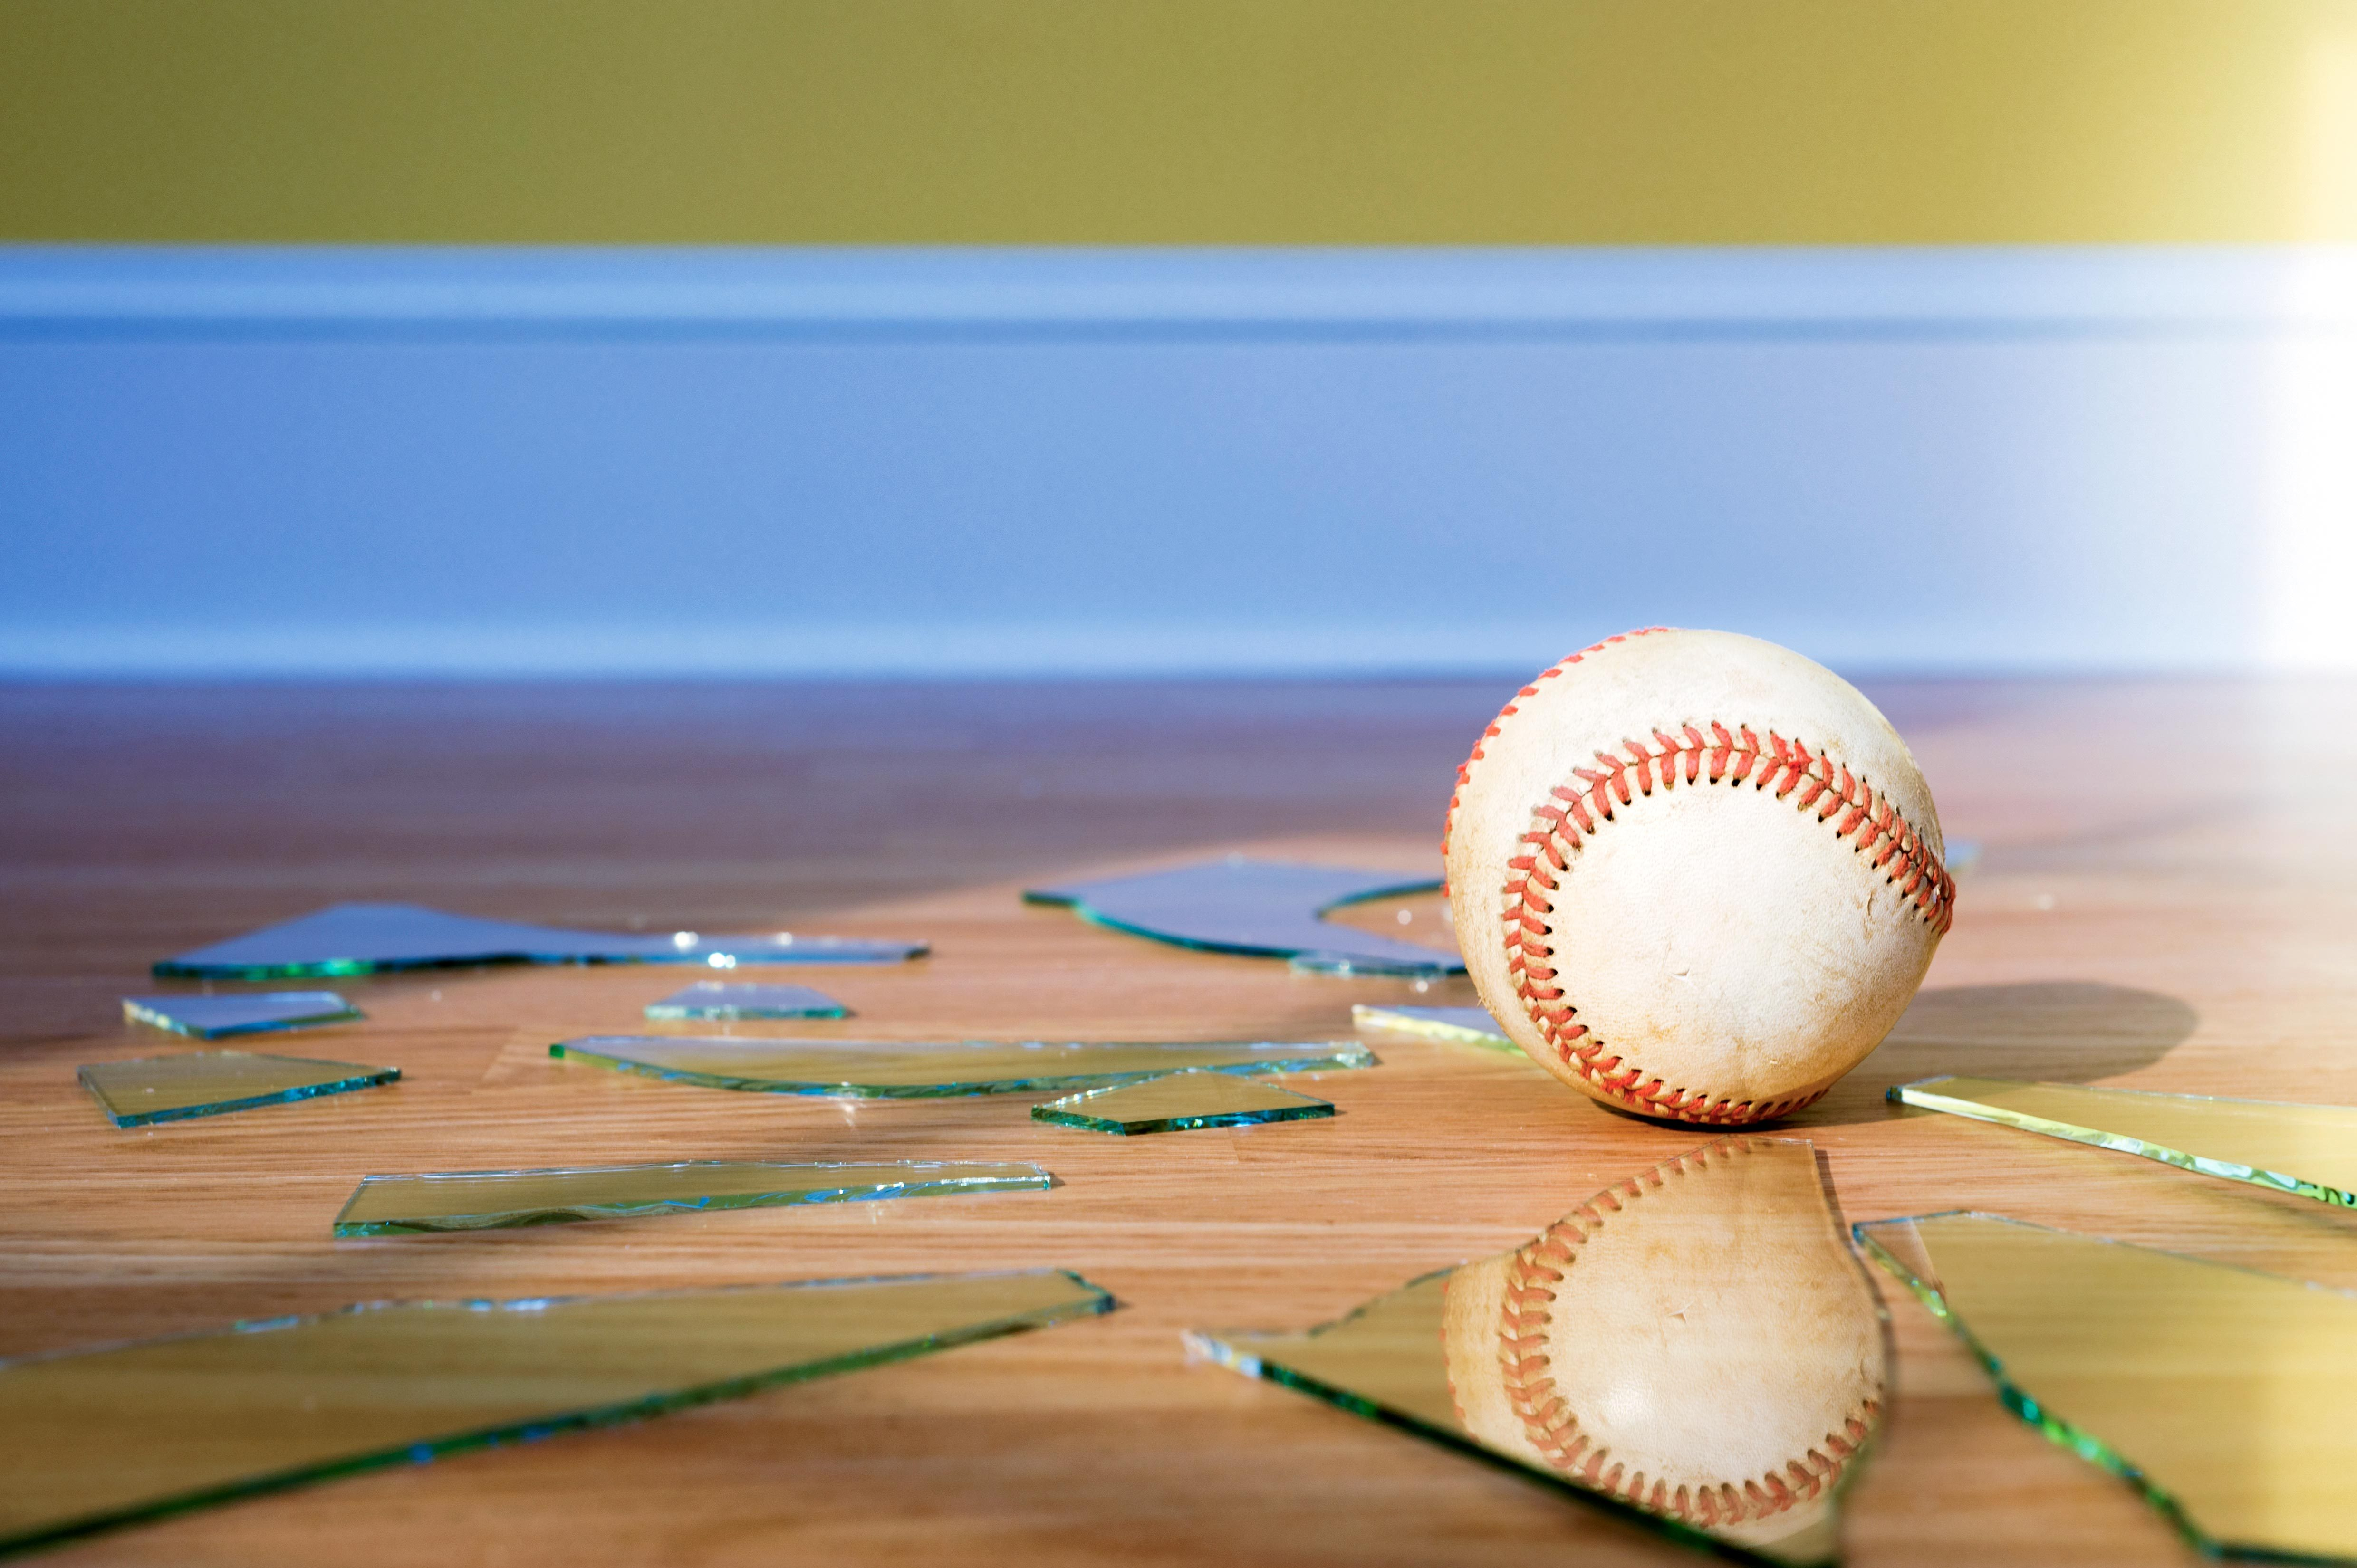 baseball on the floor among broken shards of glass